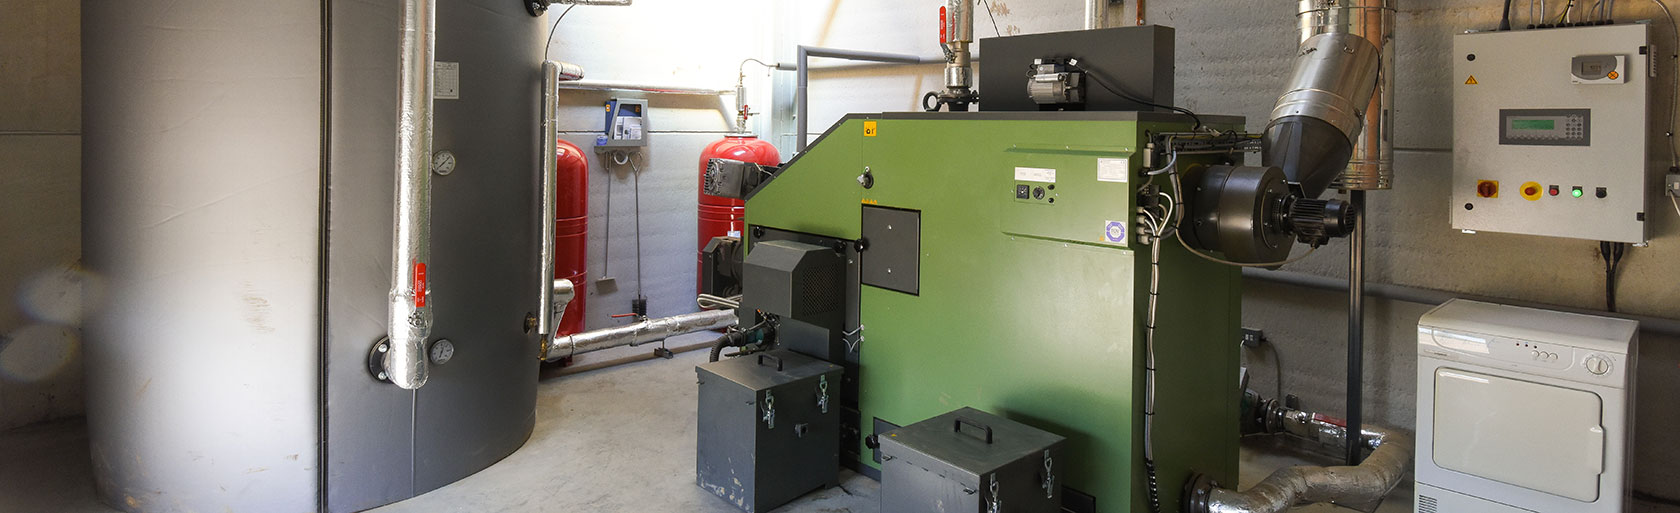 The Rookery Farm Biomass Boiler